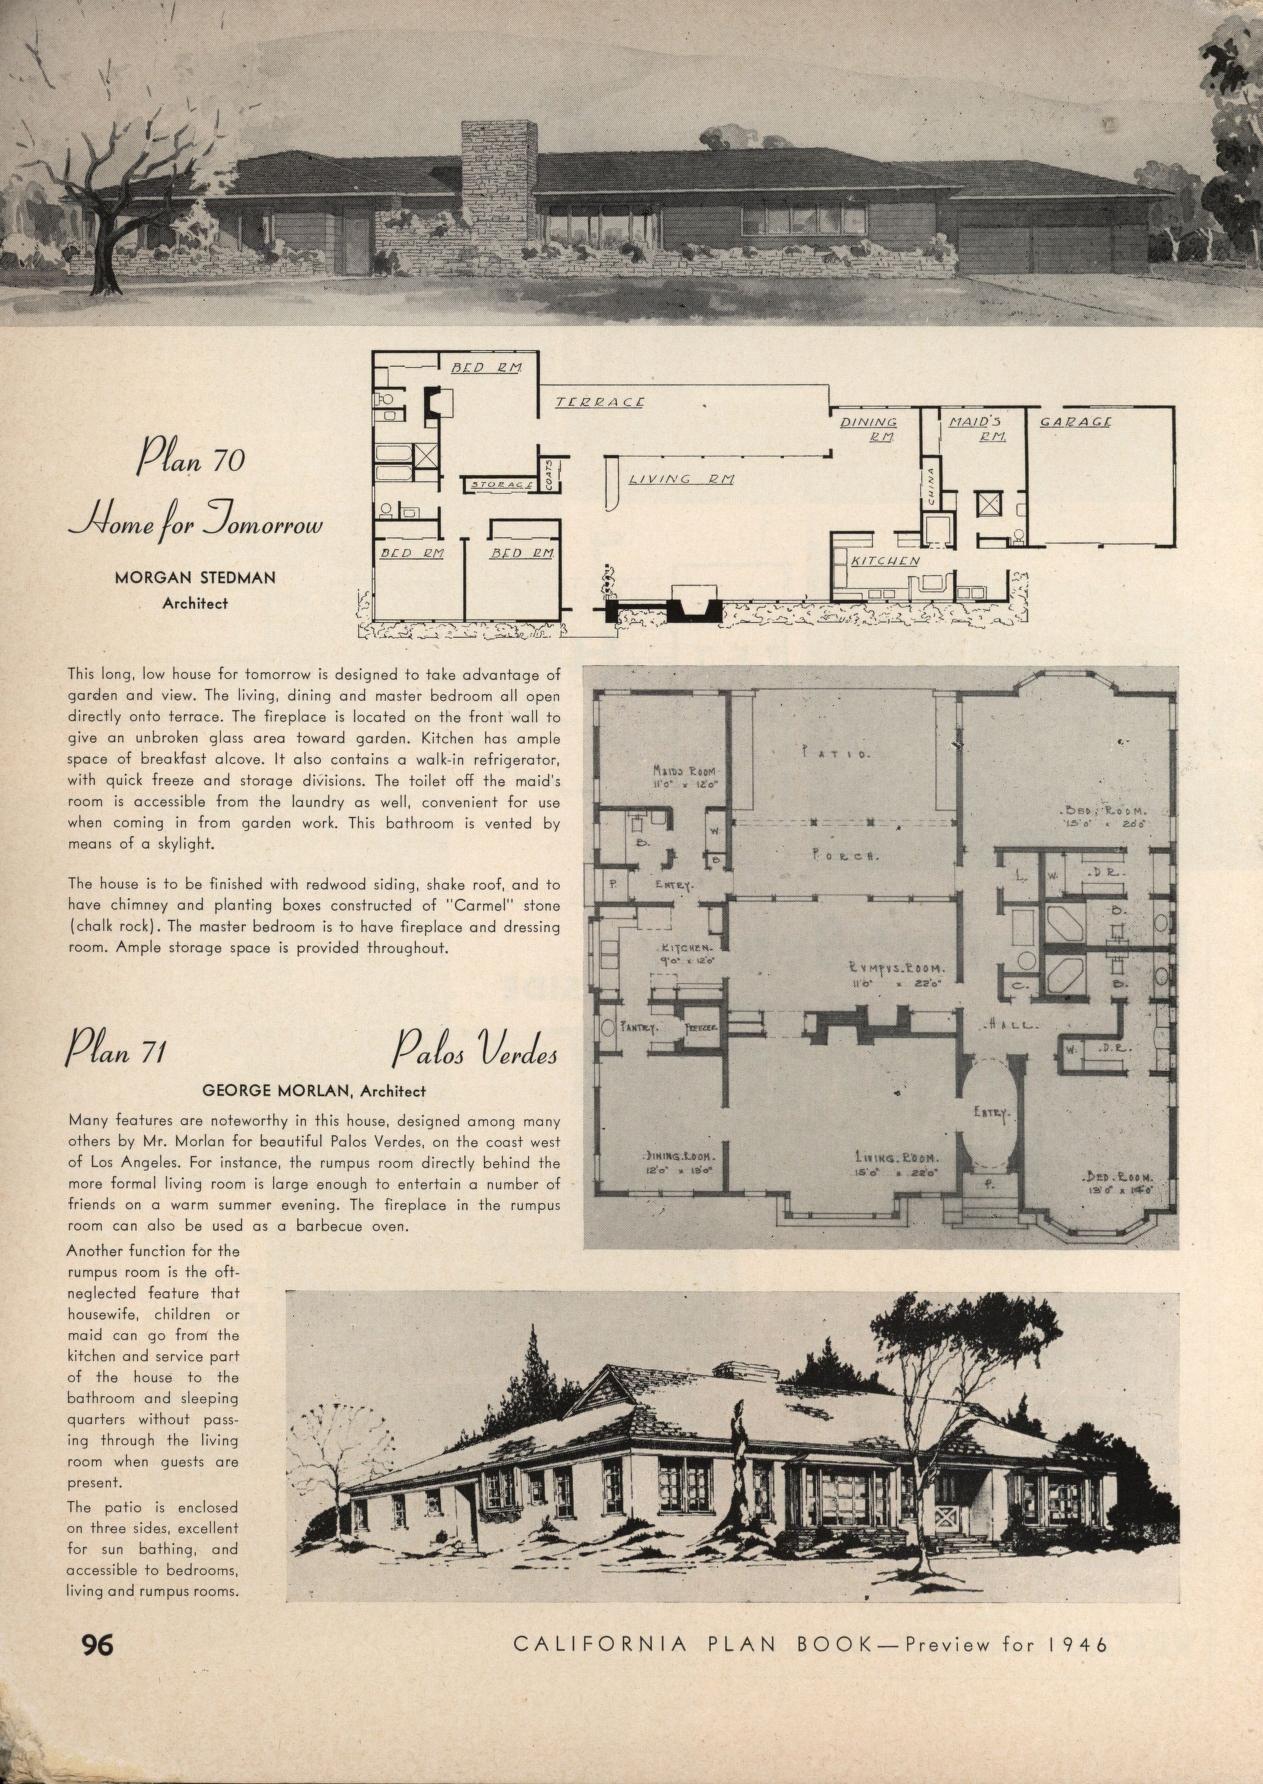 California plan book : 1946 | VinTagE HOUSE PlanS~1940s ...